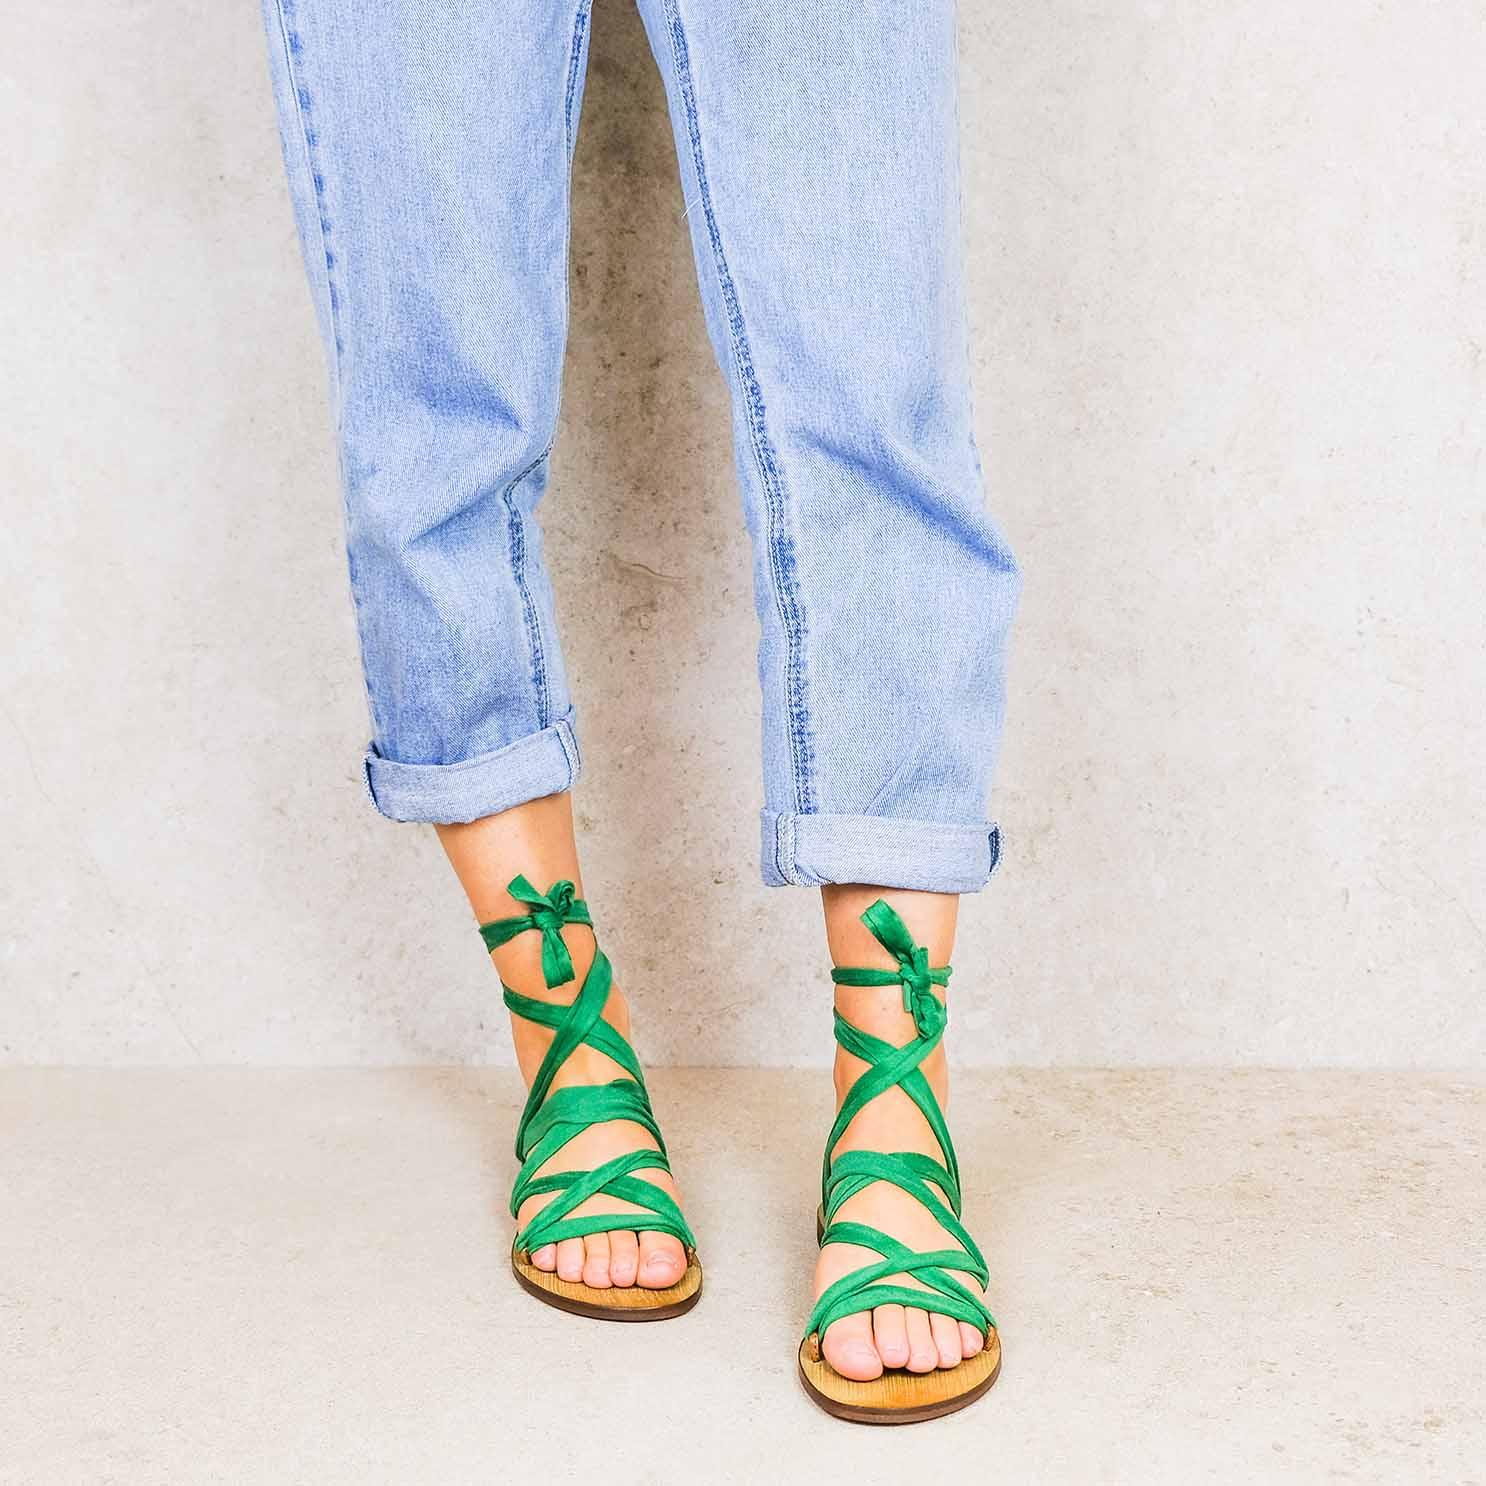 Forrest-green_suede linten lintsandalen sandals travelsandals vegan sustainable sandals wikkelsandalen